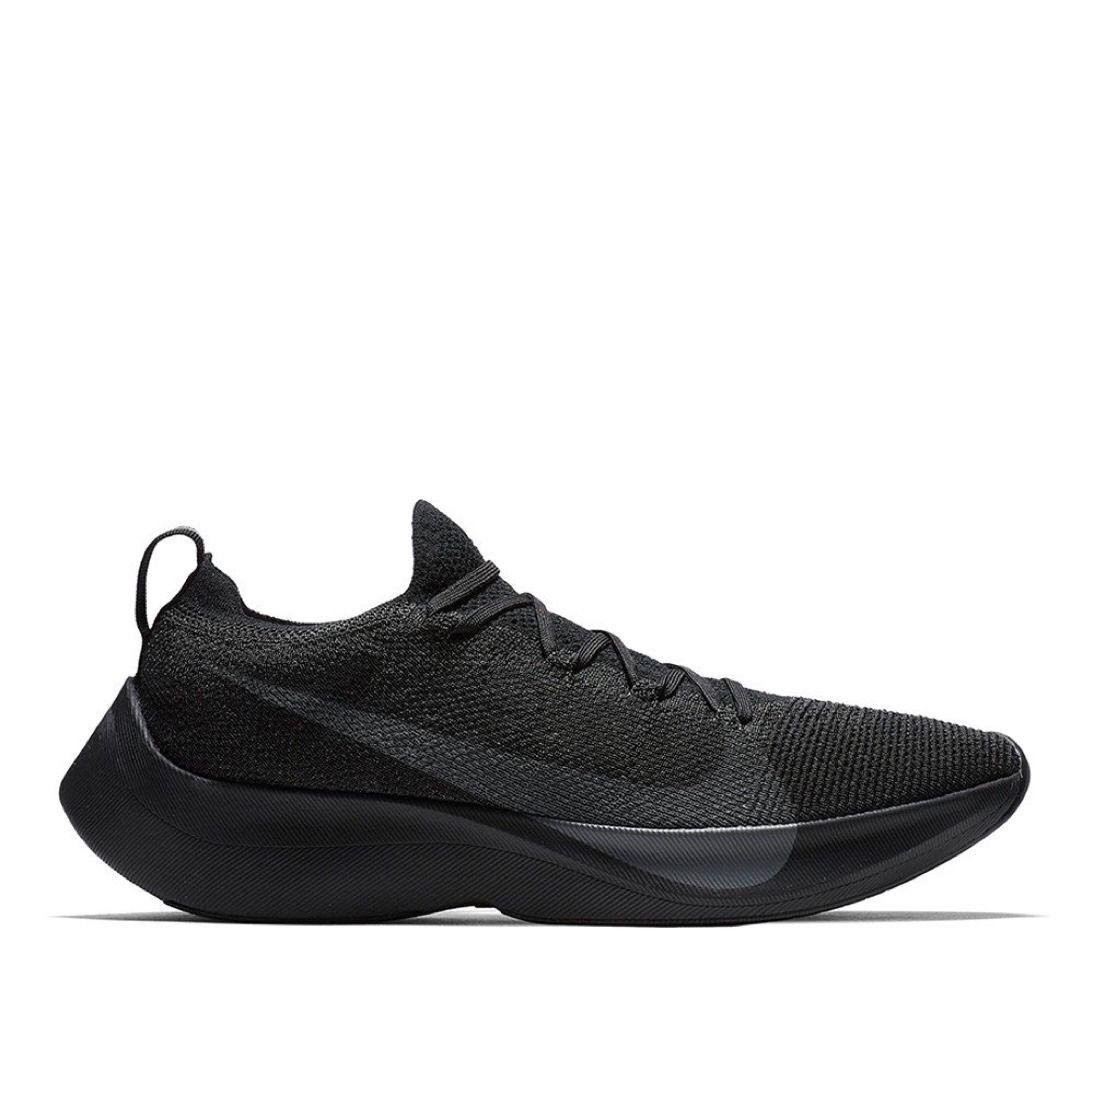 f7c4d3545878f Nike Vapor Street Flyknit Black Spring 2018 Release